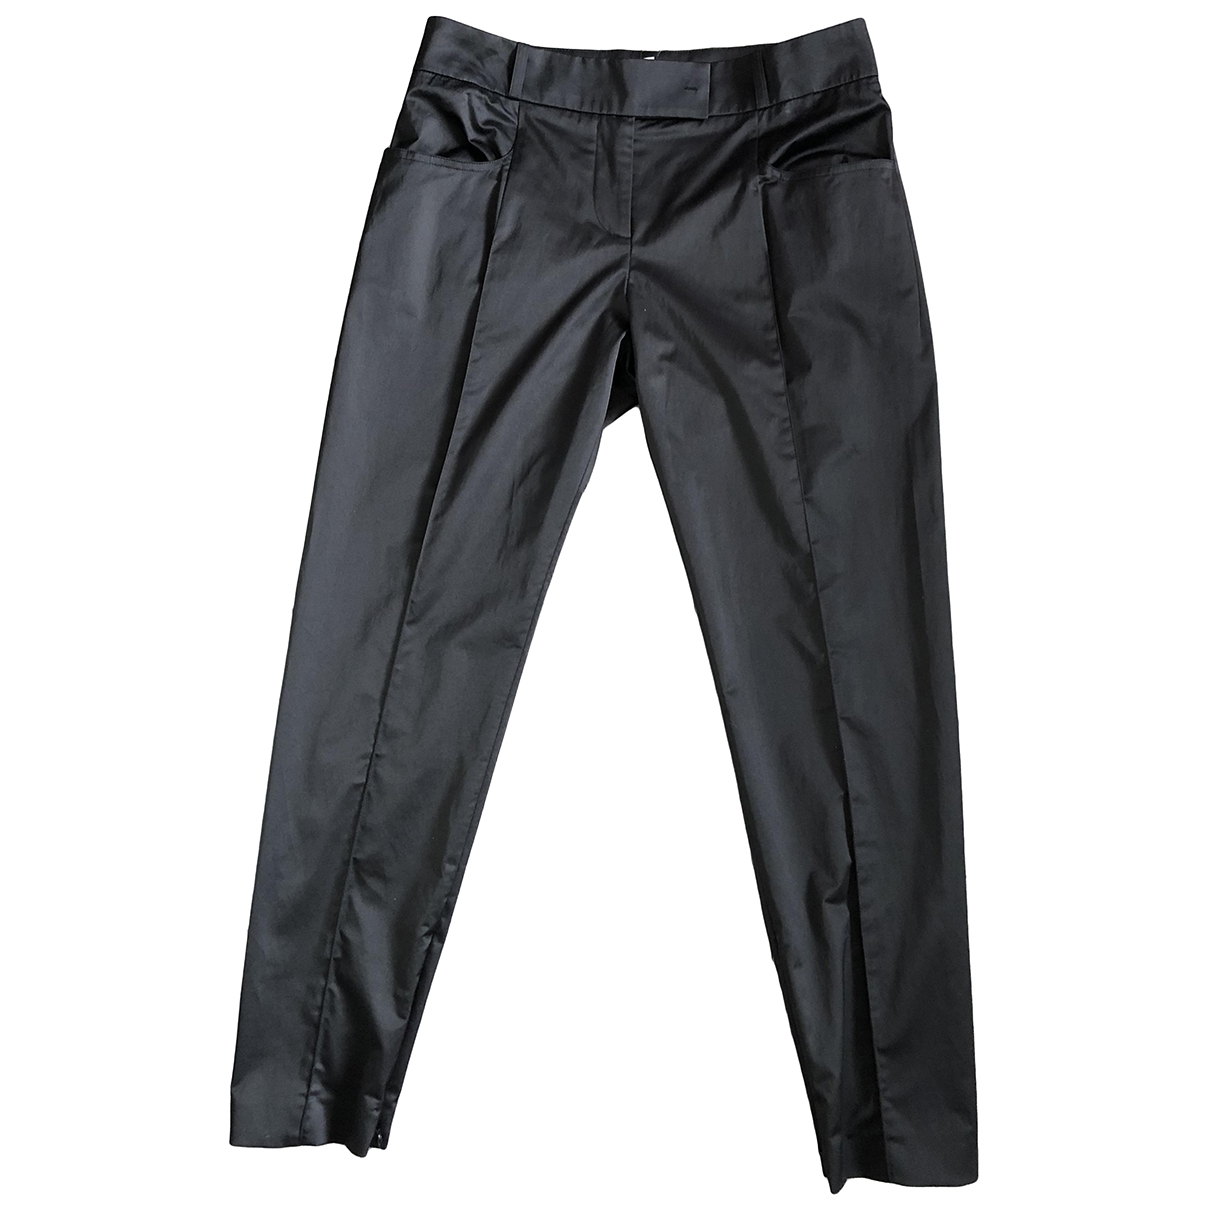 Paule Ka \N Black Cotton Trousers for Women 40 FR